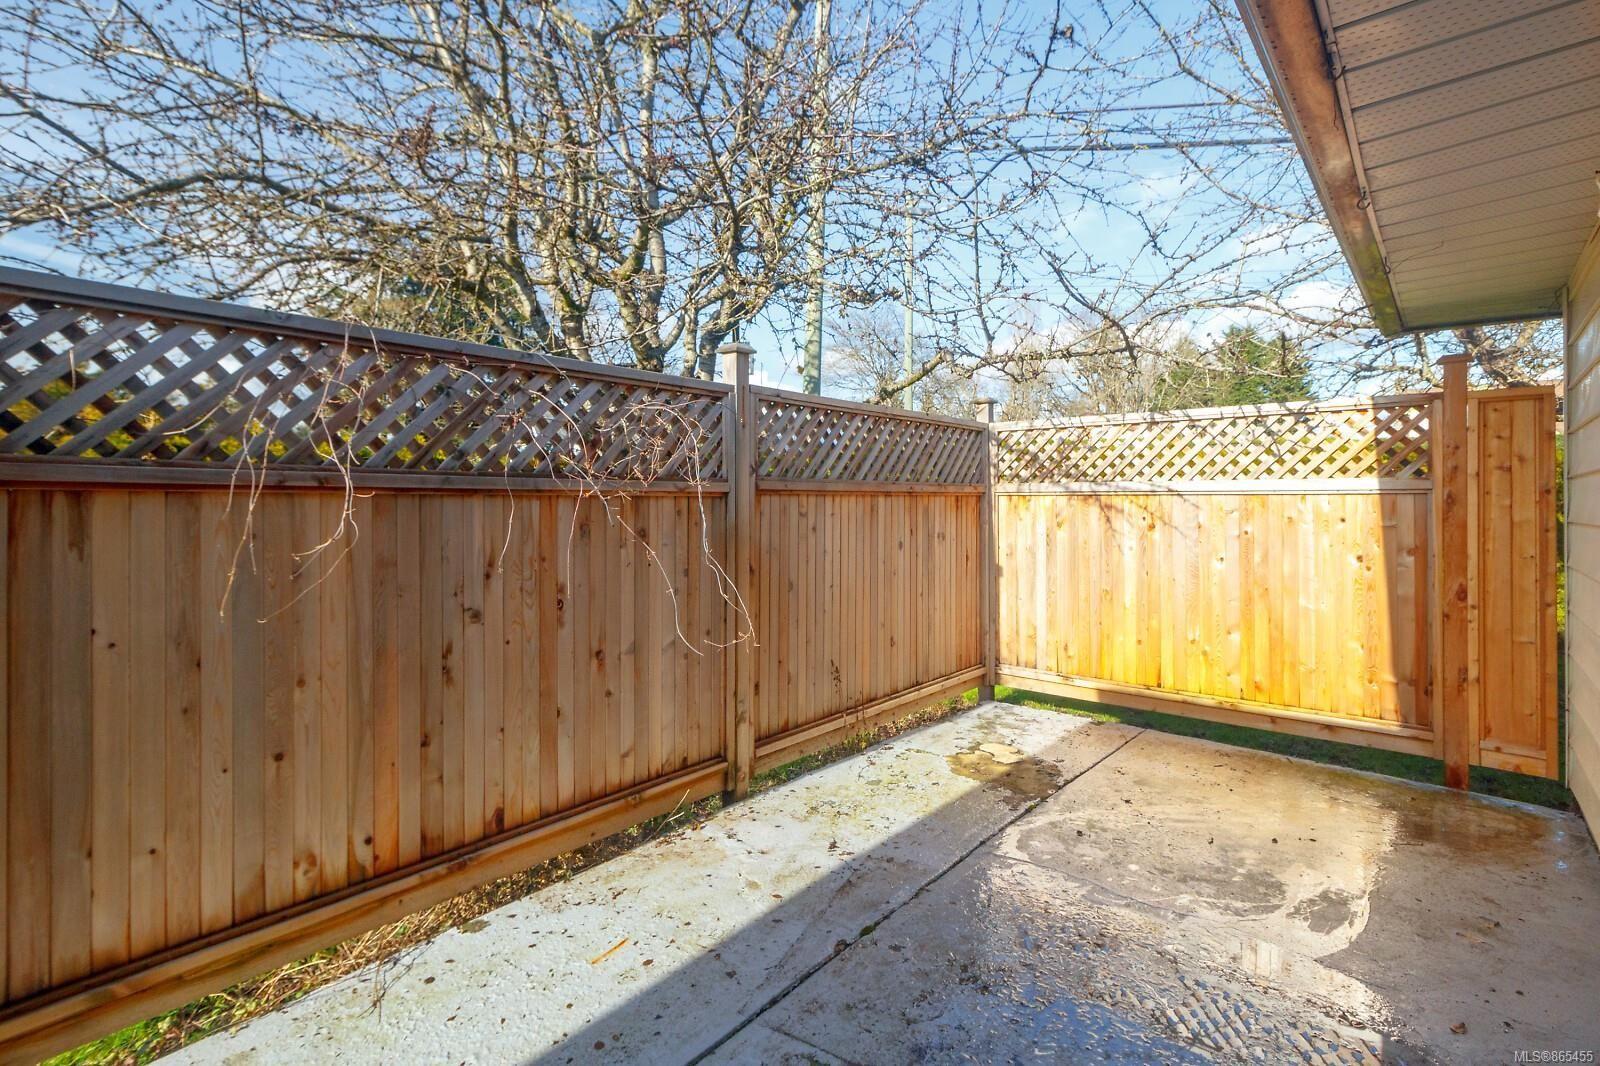 Photo 25: Photos: 399 Beech Ave in : Du East Duncan House for sale (Duncan)  : MLS®# 865455